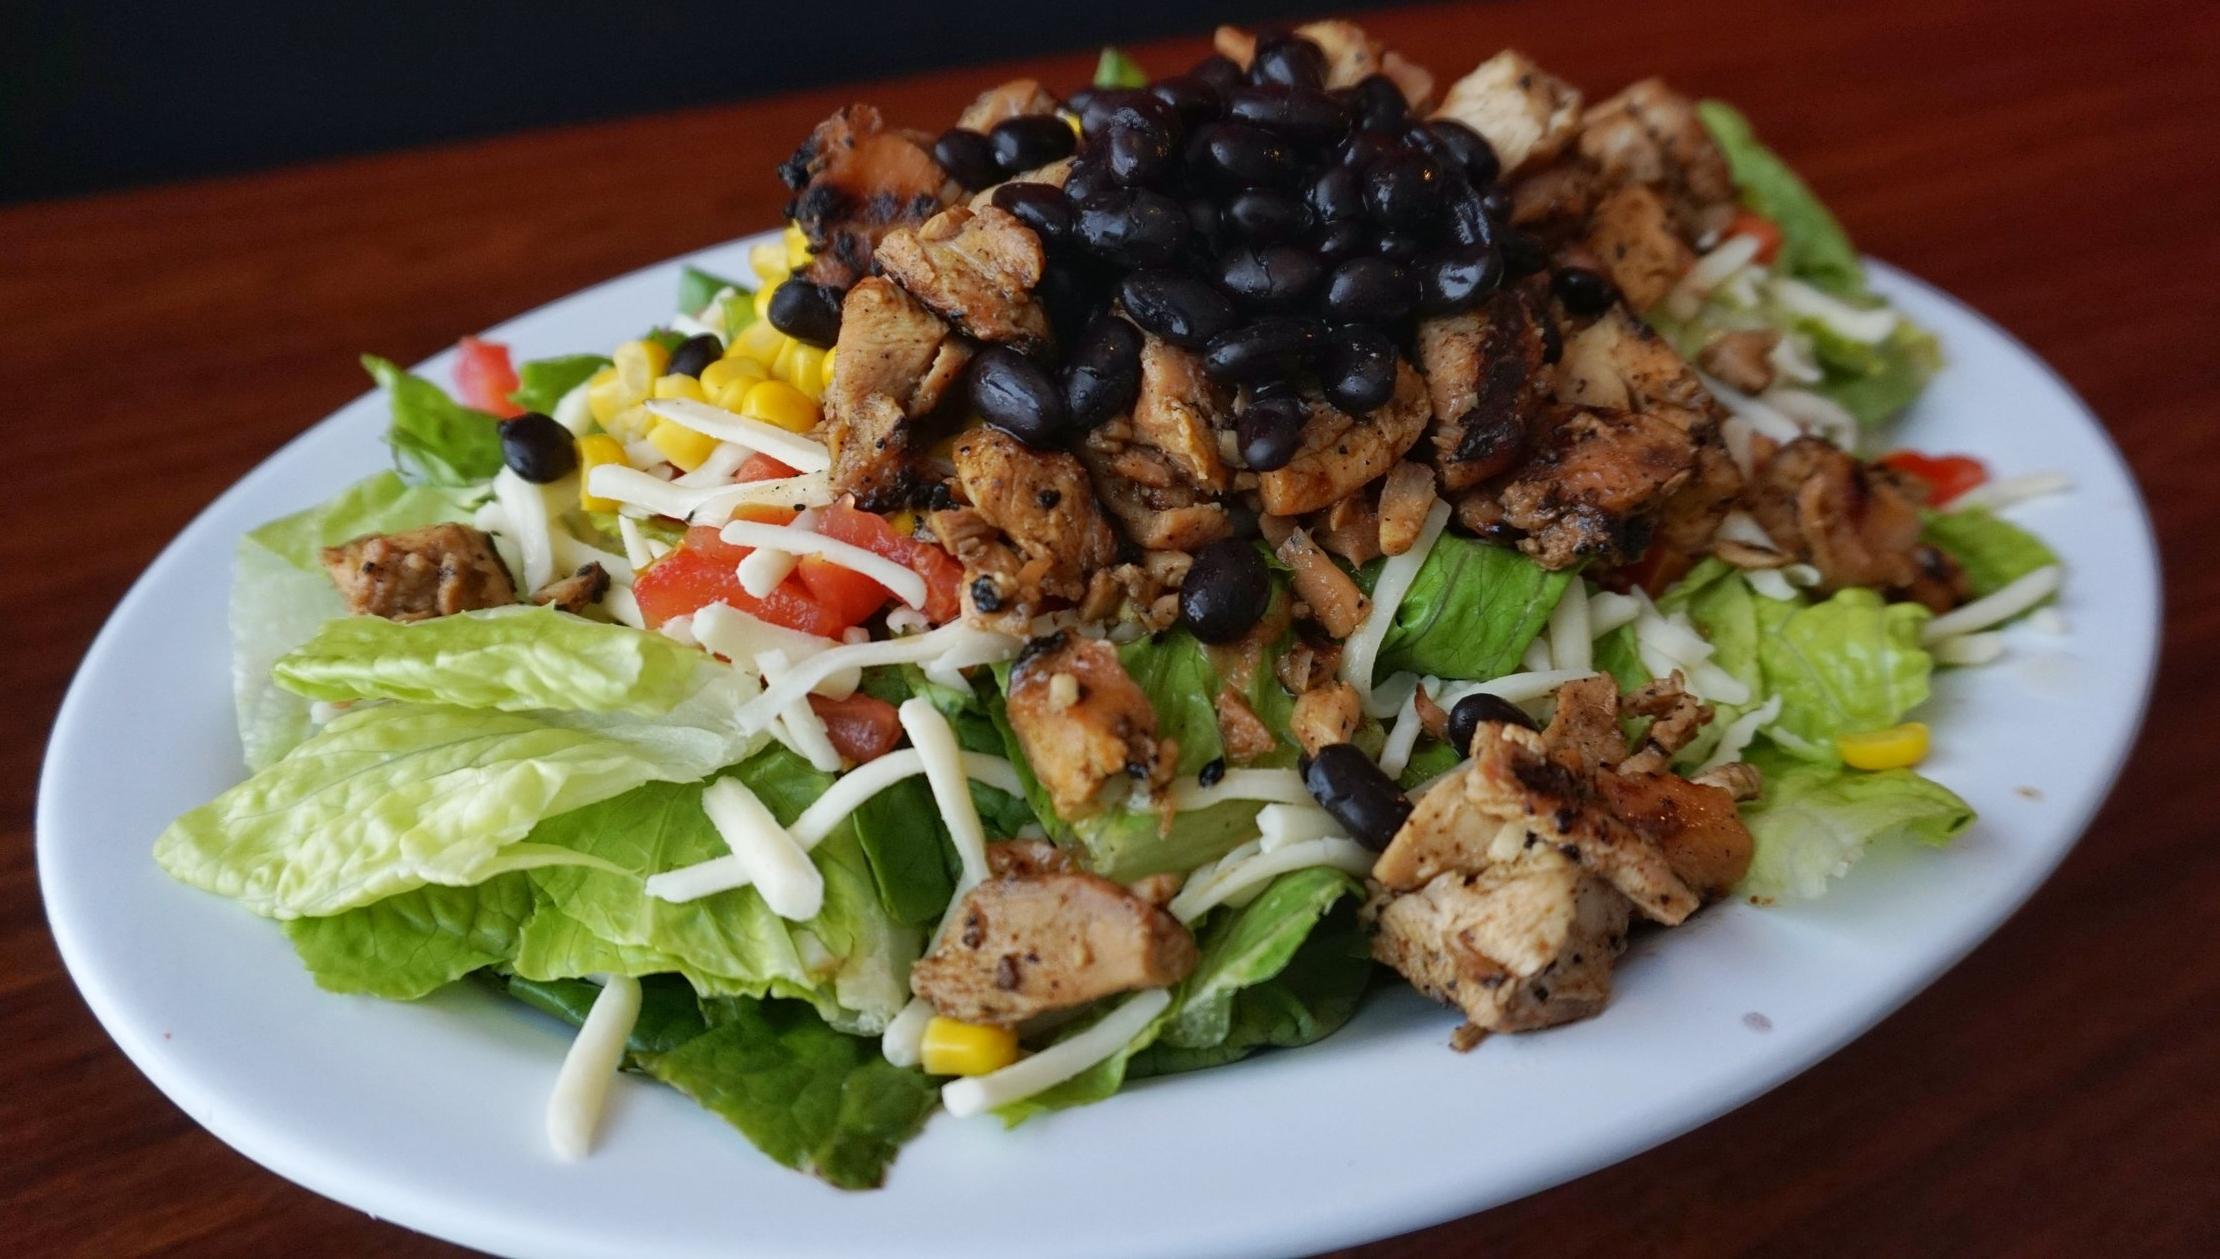 Ranchero Salad